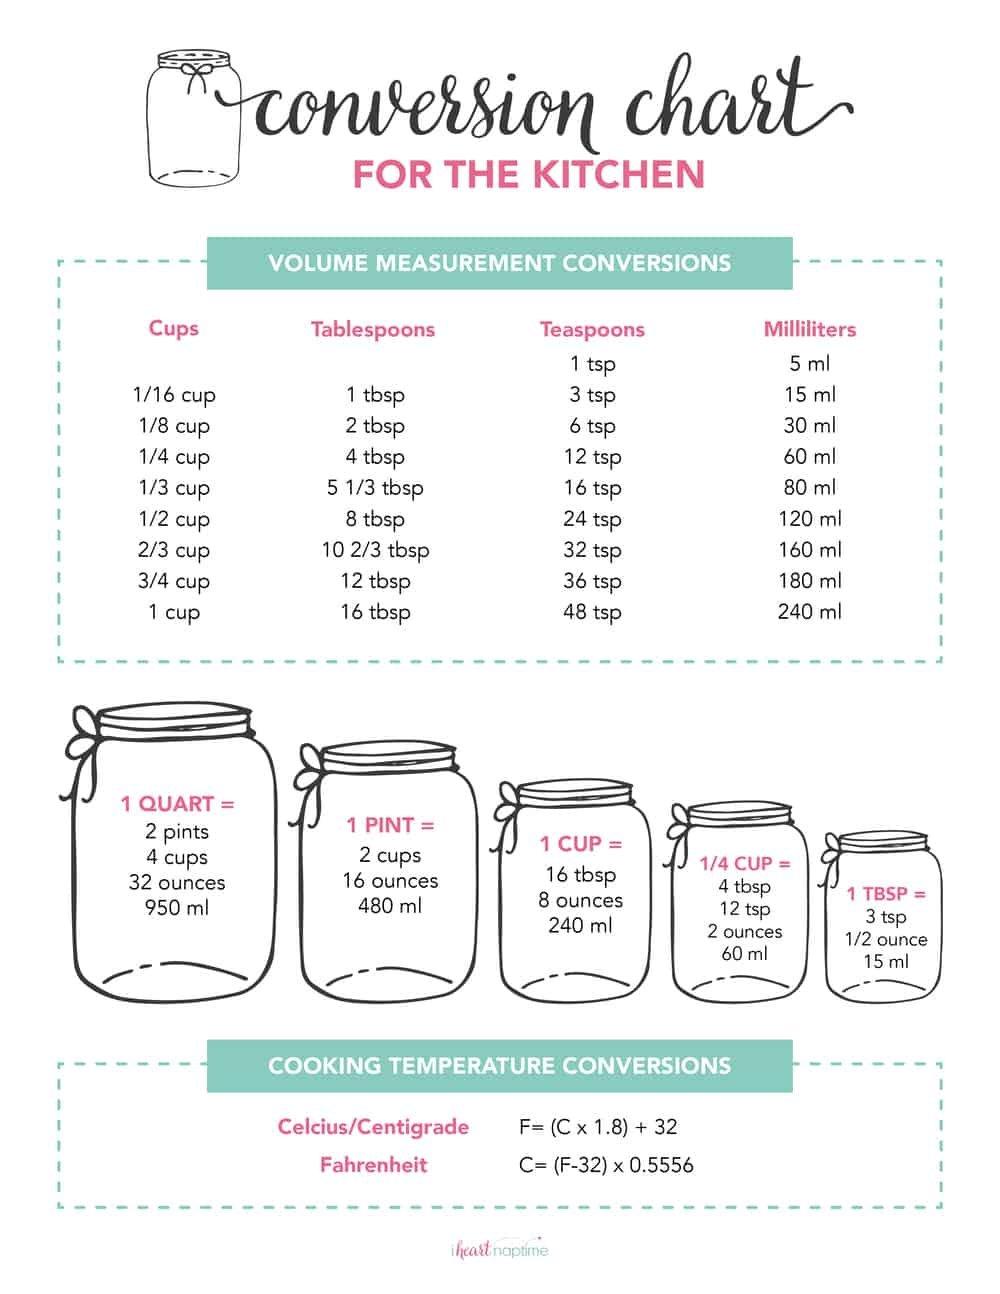 Free Printable Kitchen Conversion Chart  I Heart Naptime Within Kitchen Equivalents Worksheet